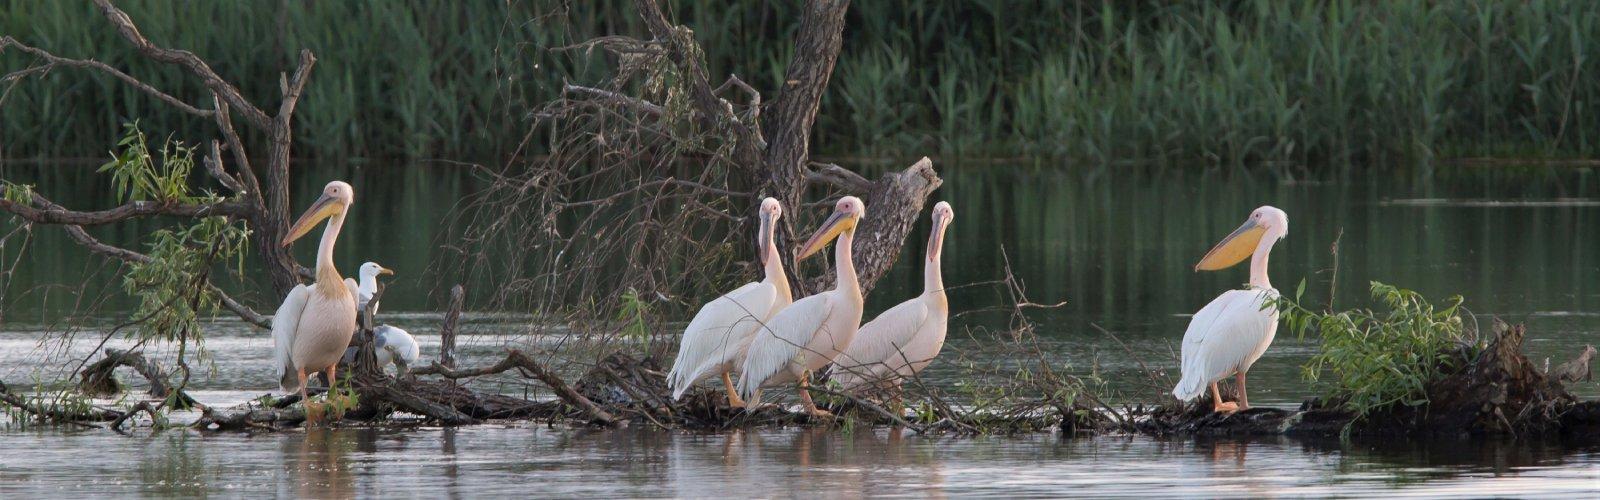 Roemenië - Donau Delta: Roze Pelikanen - Jos van den Berg